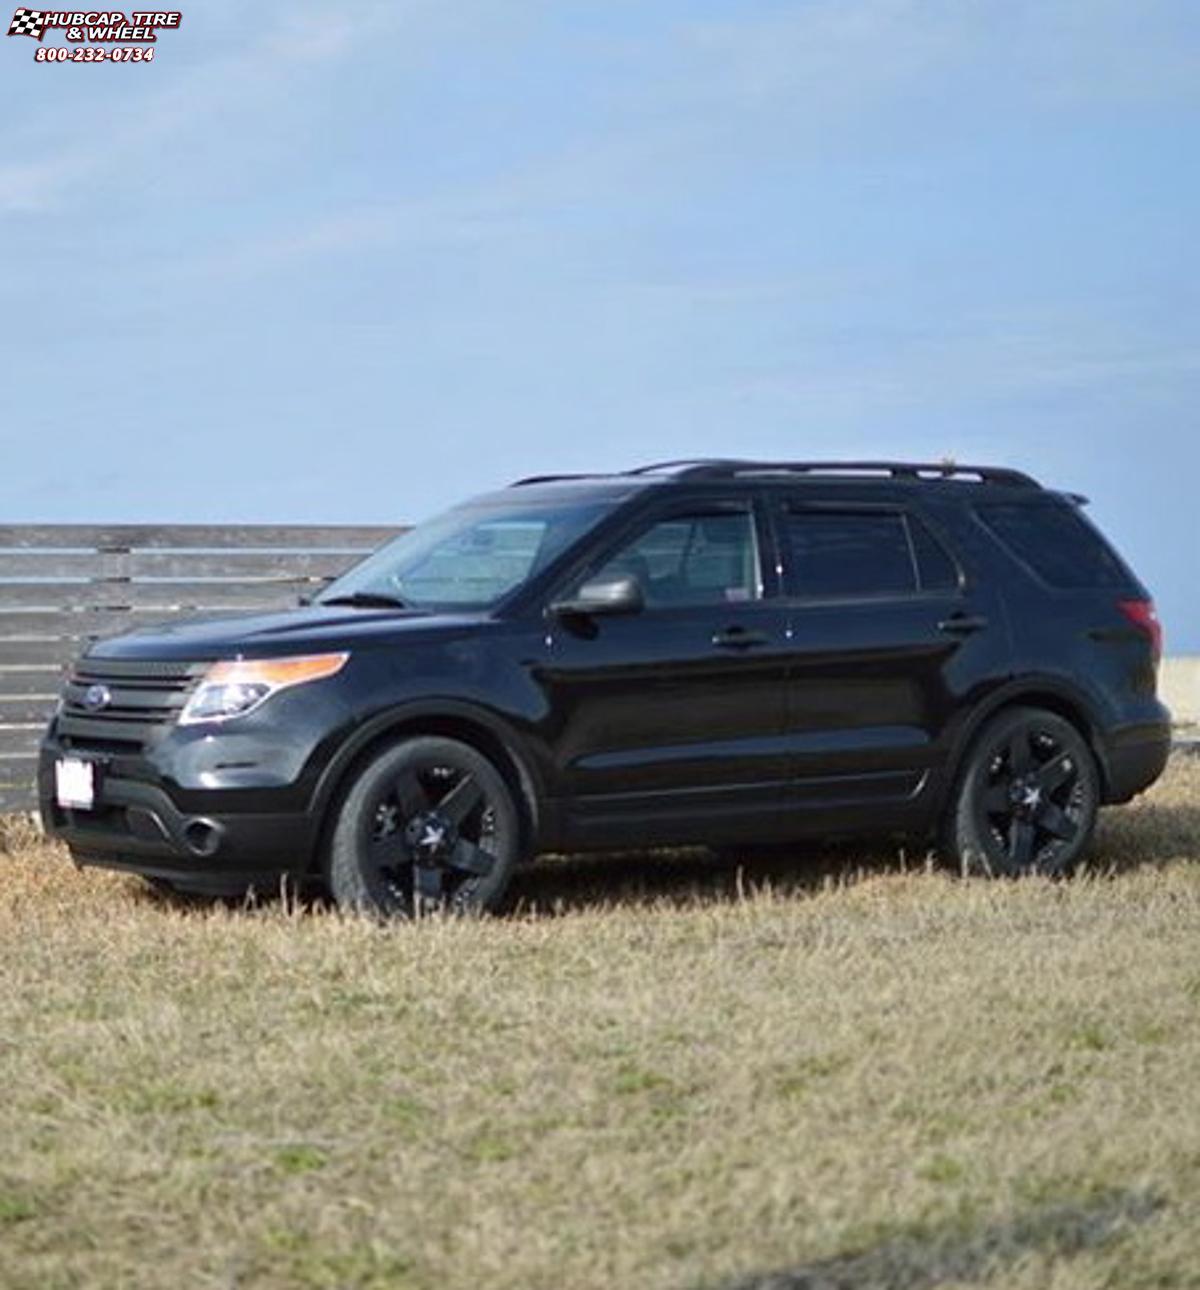 Ford Explorer Black Rims >> Ford Explorer Xd Series Xd775 Rockstar Wheels Matte Black